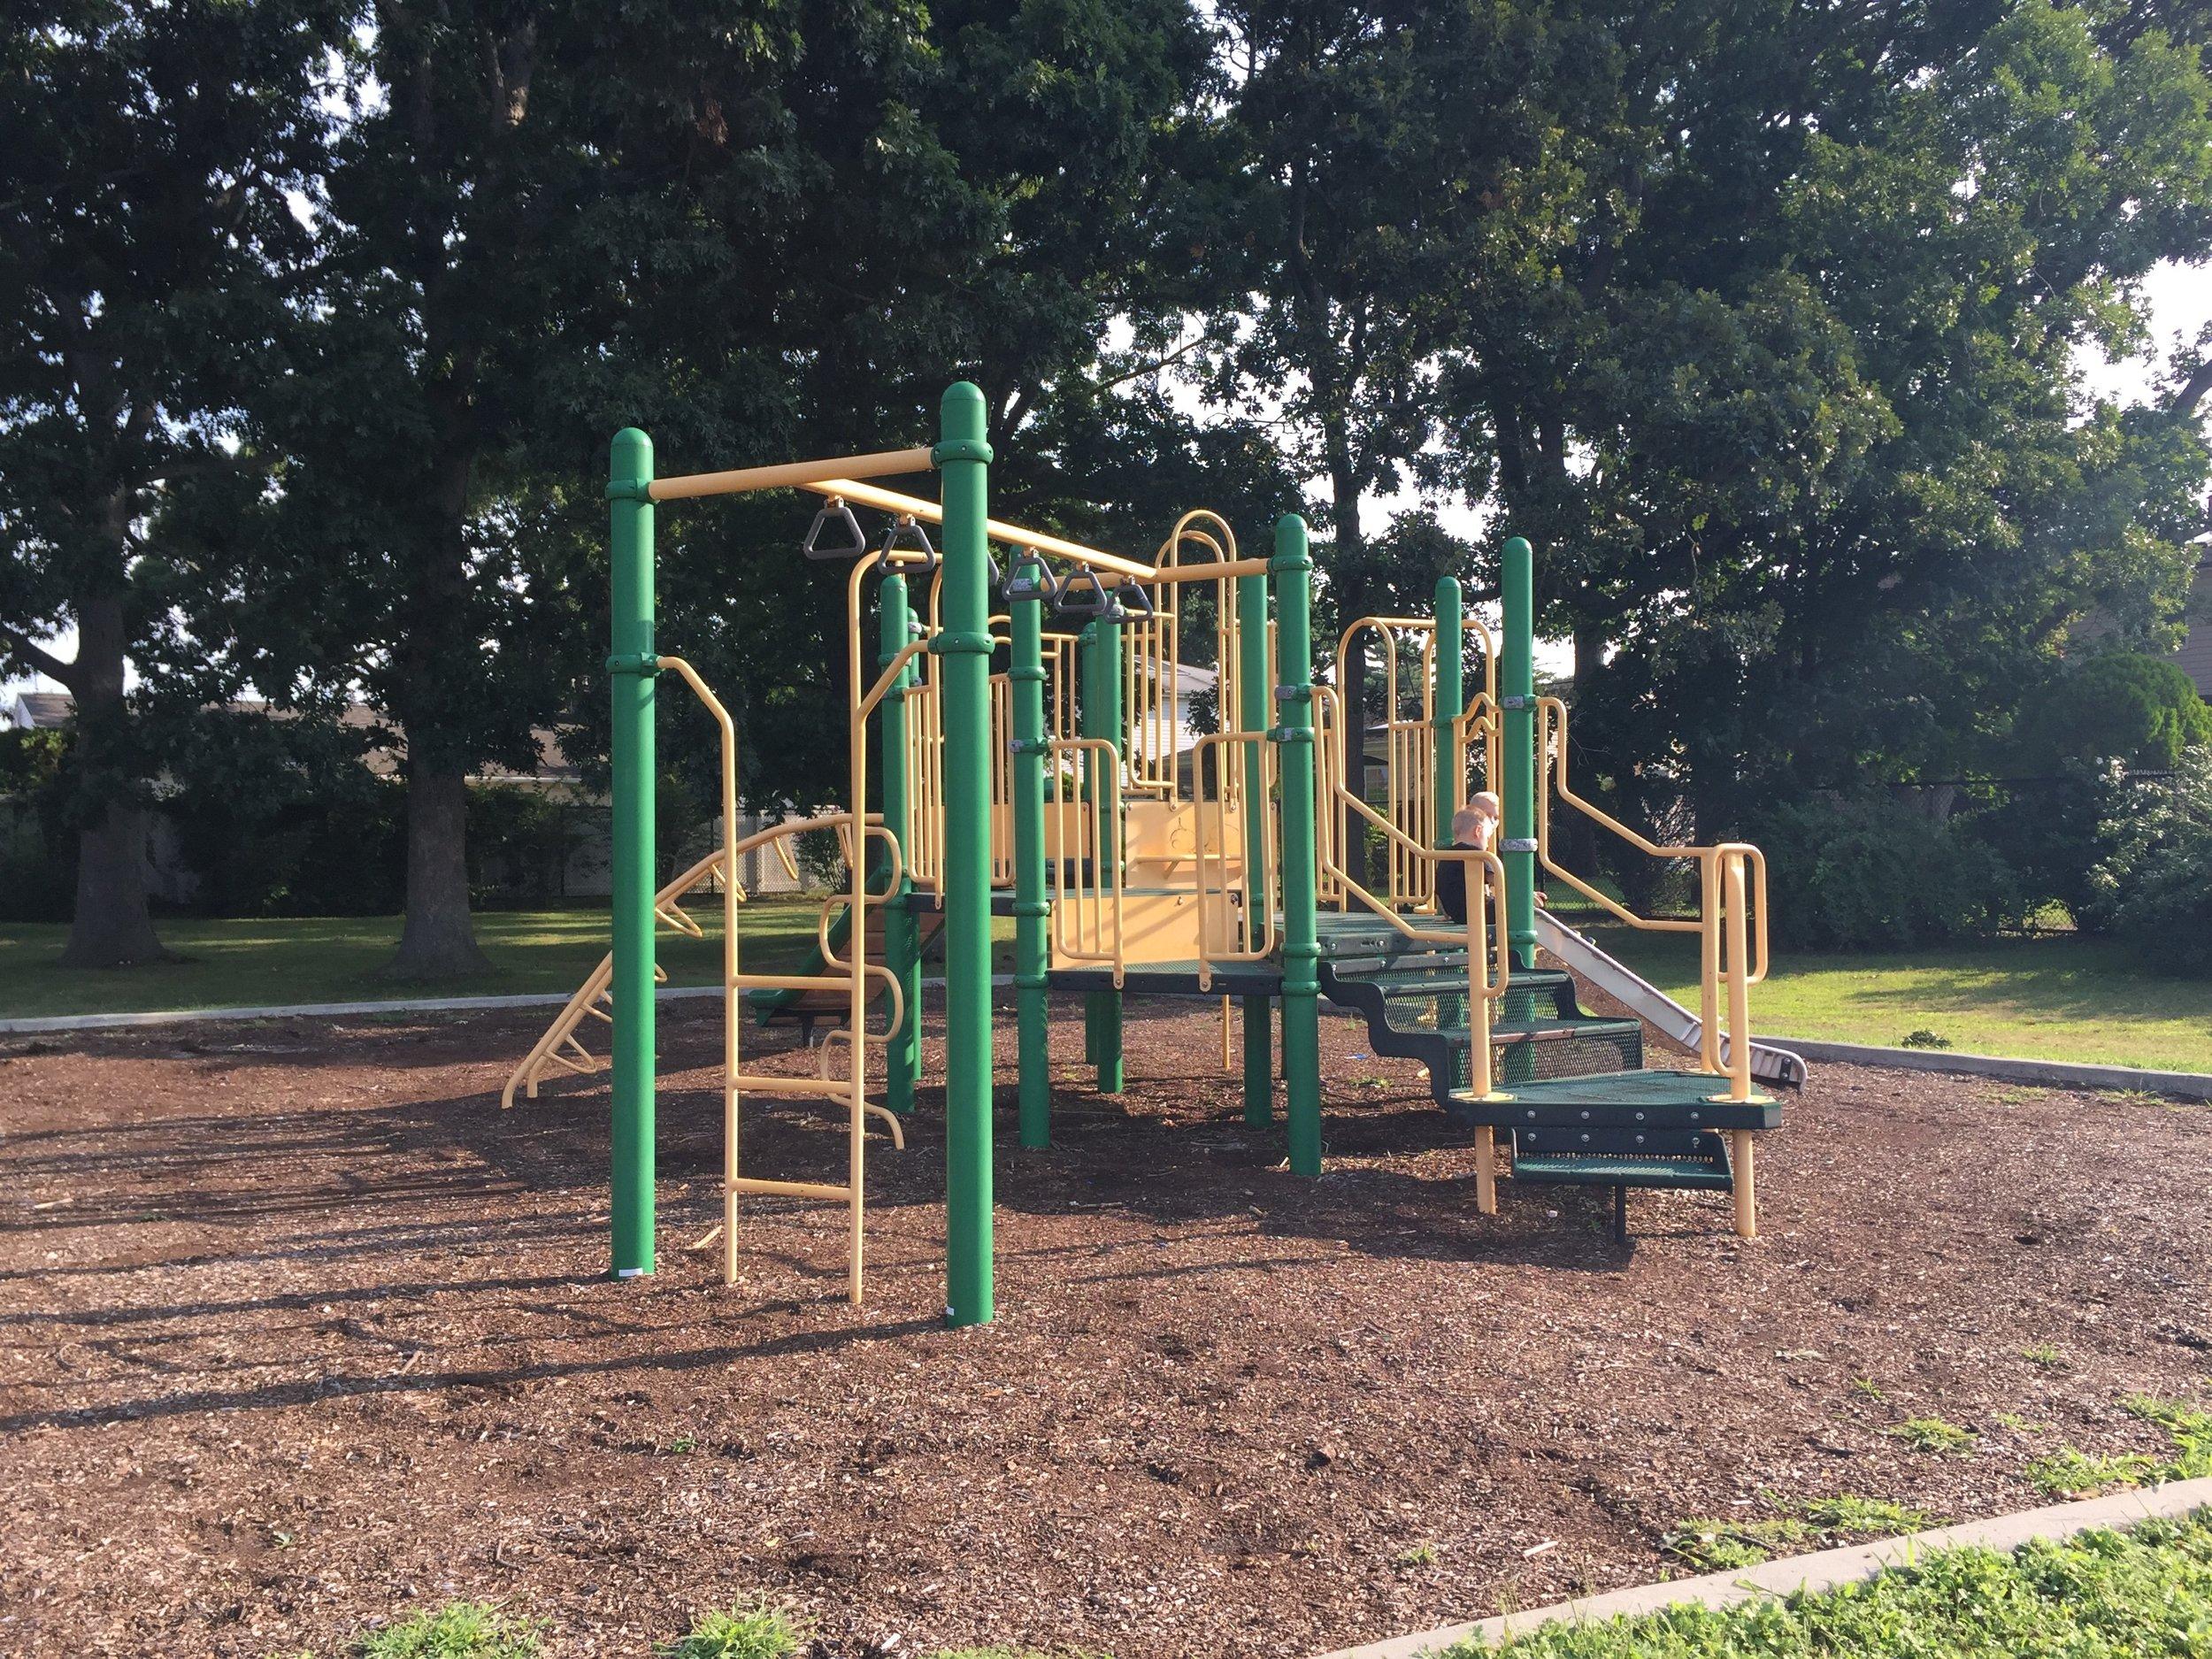 North Oaks Playground